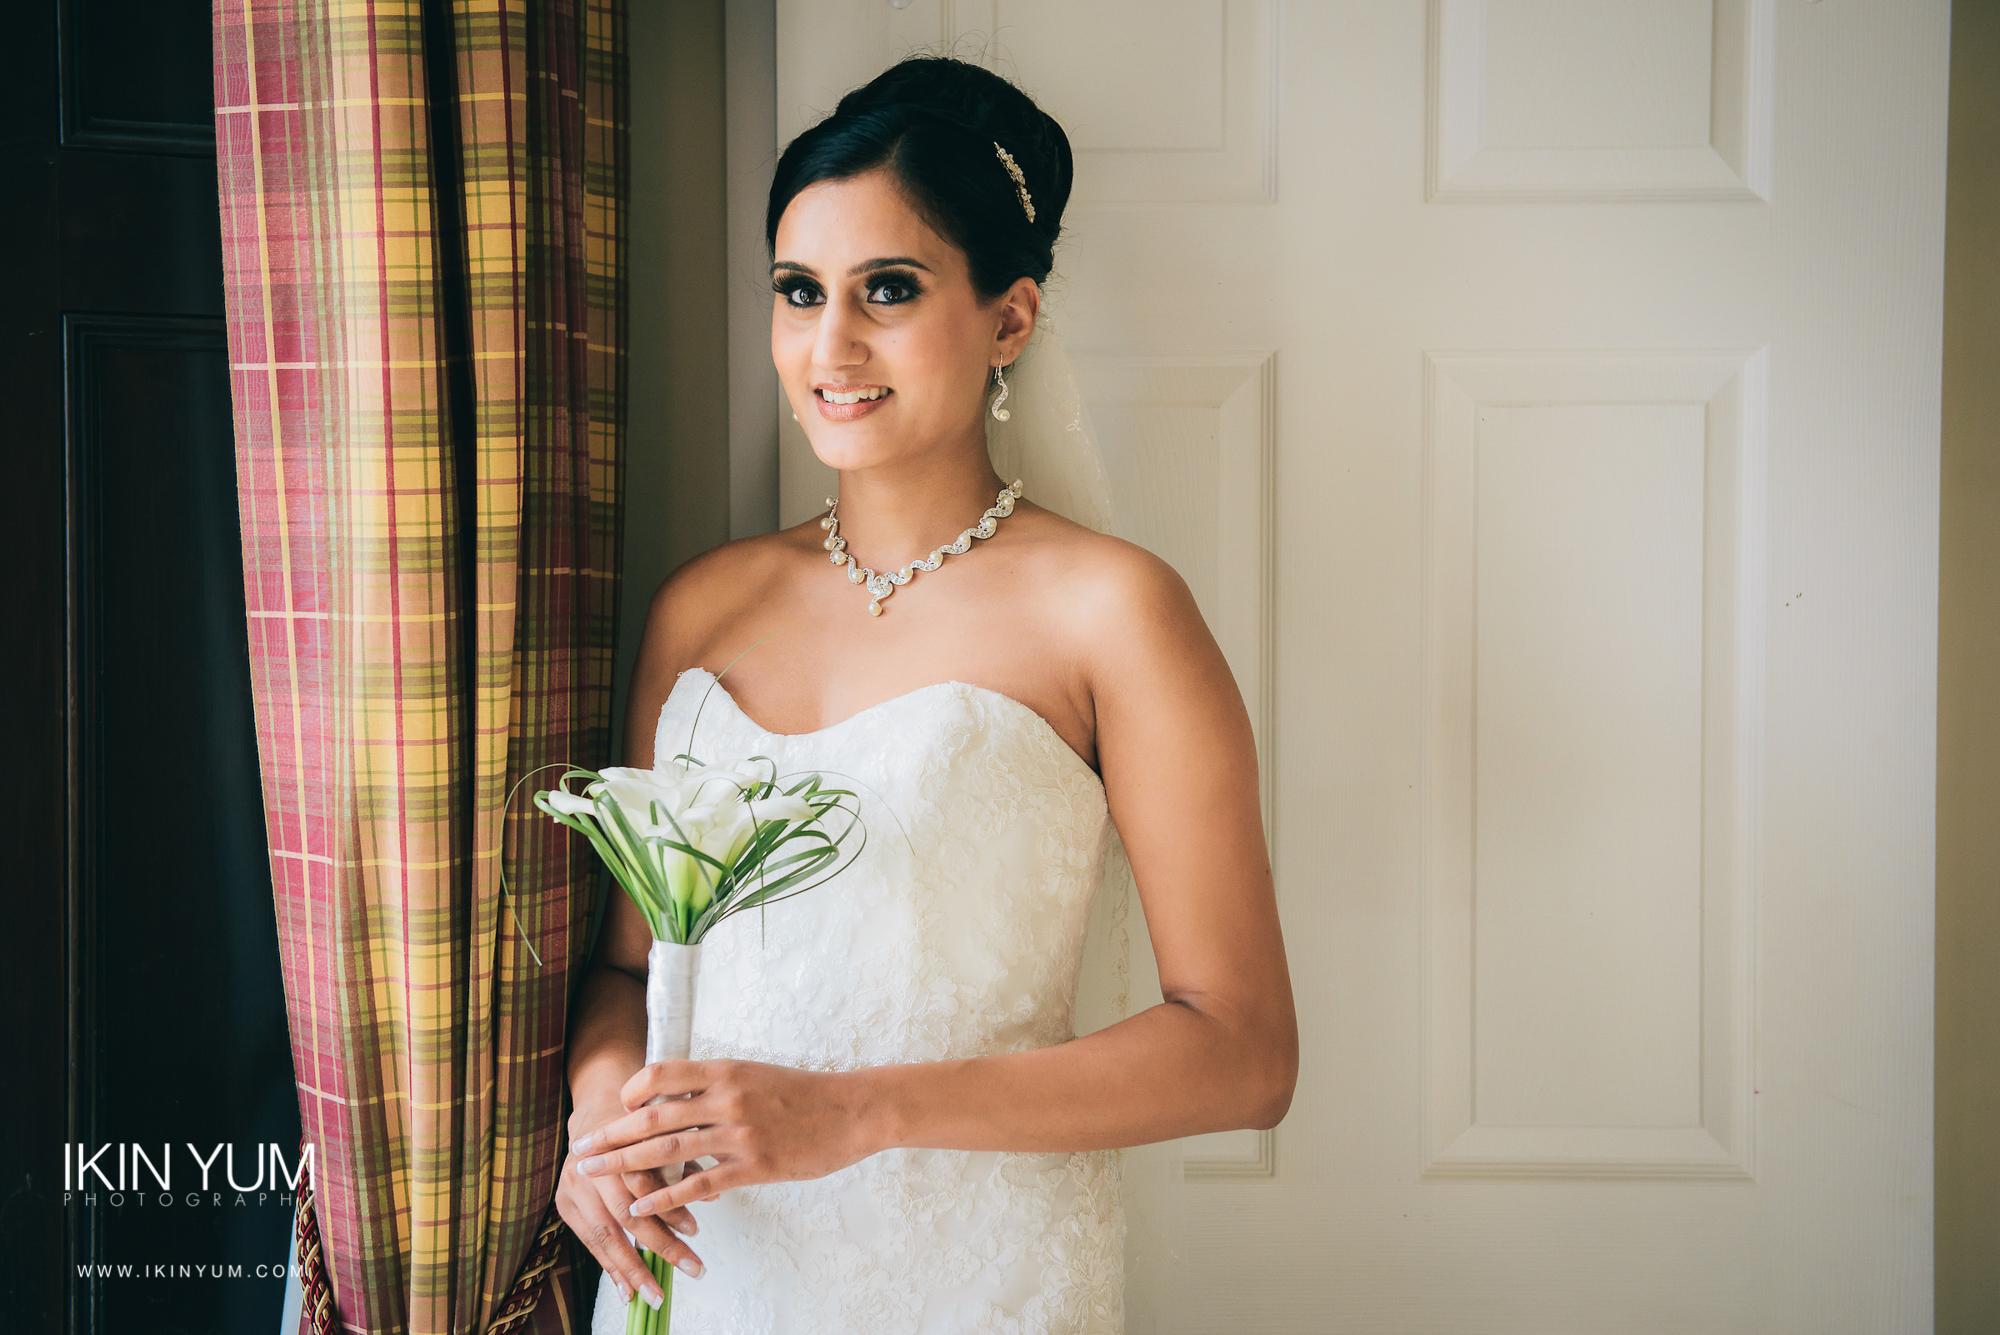 Froyle Park Indian Wedding - Ikin Yum Photography-042.jpg